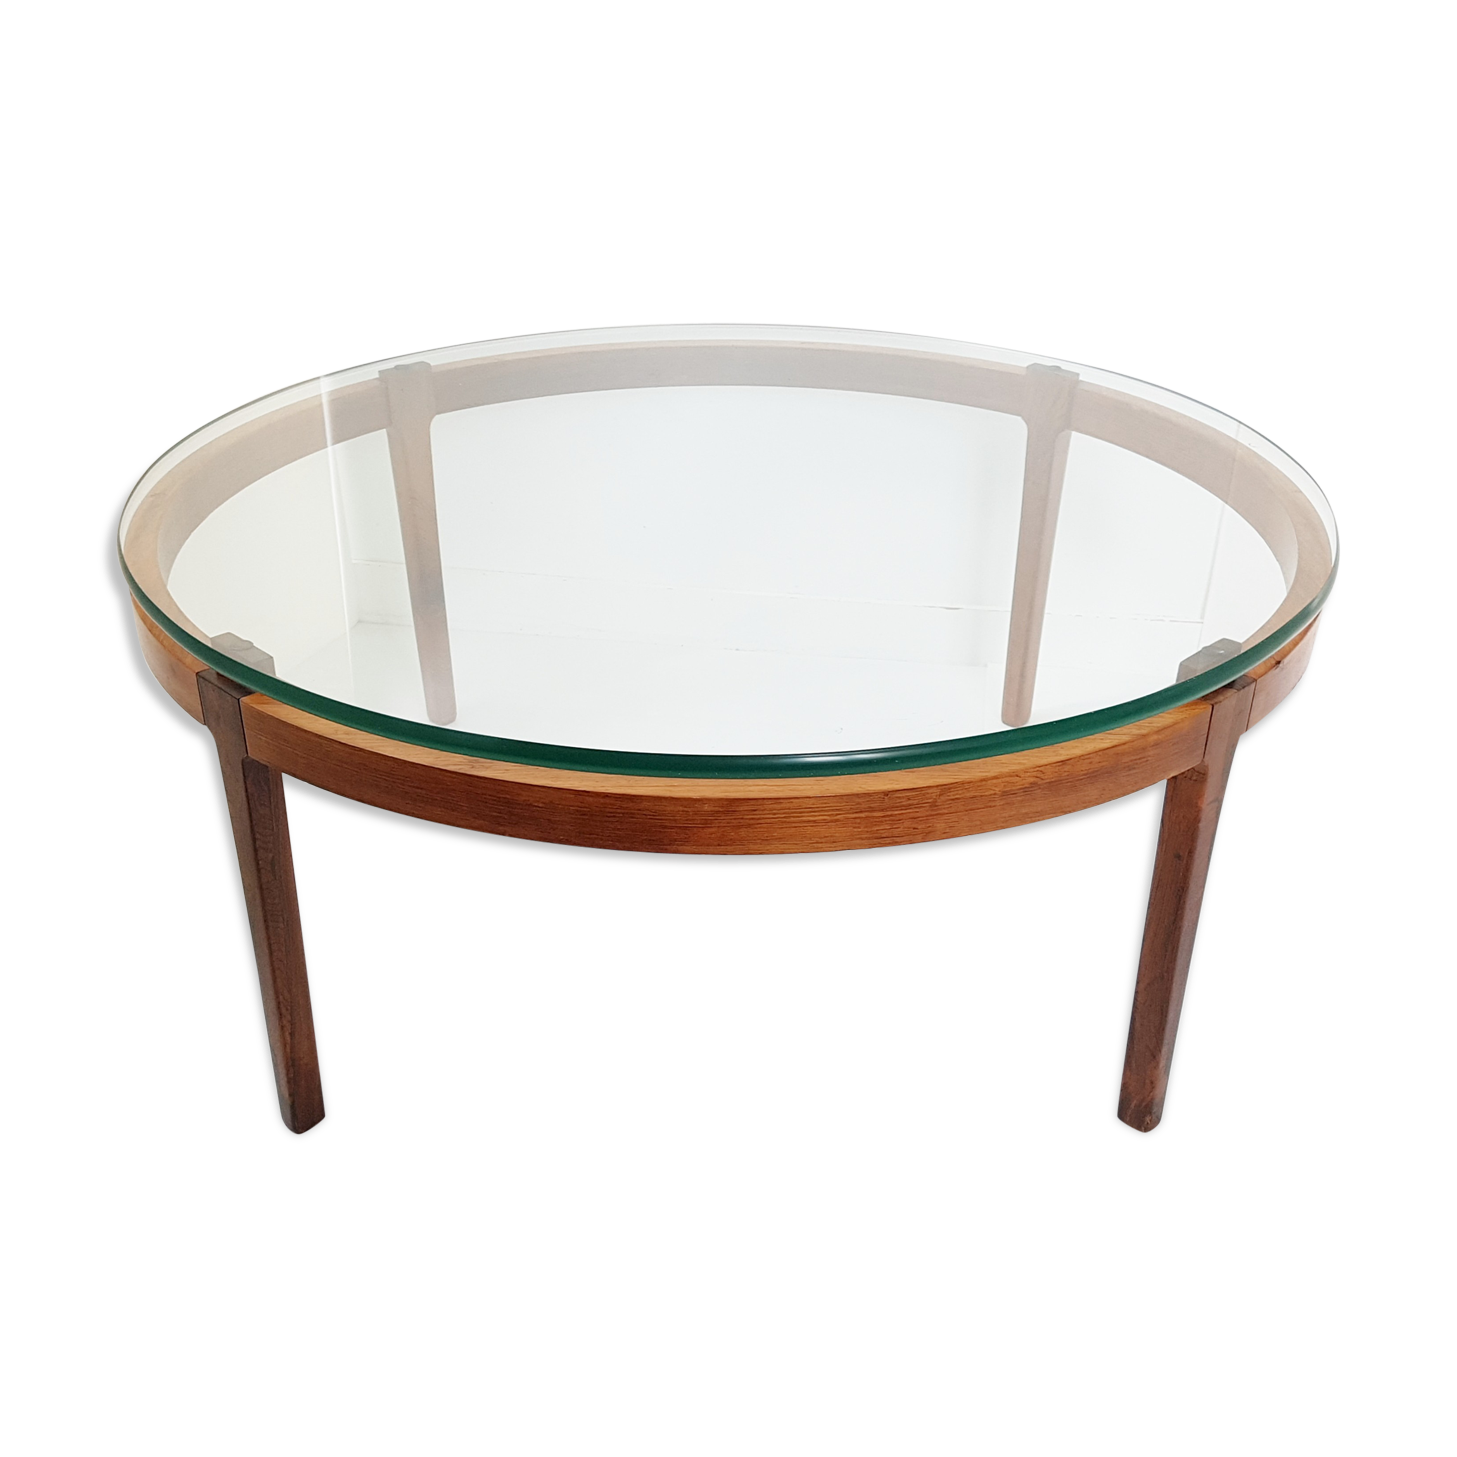 table-basse-ronde-scandinave-en-teck-palissandre-1960_original Incroyable De Table Basse Palissandre Schème